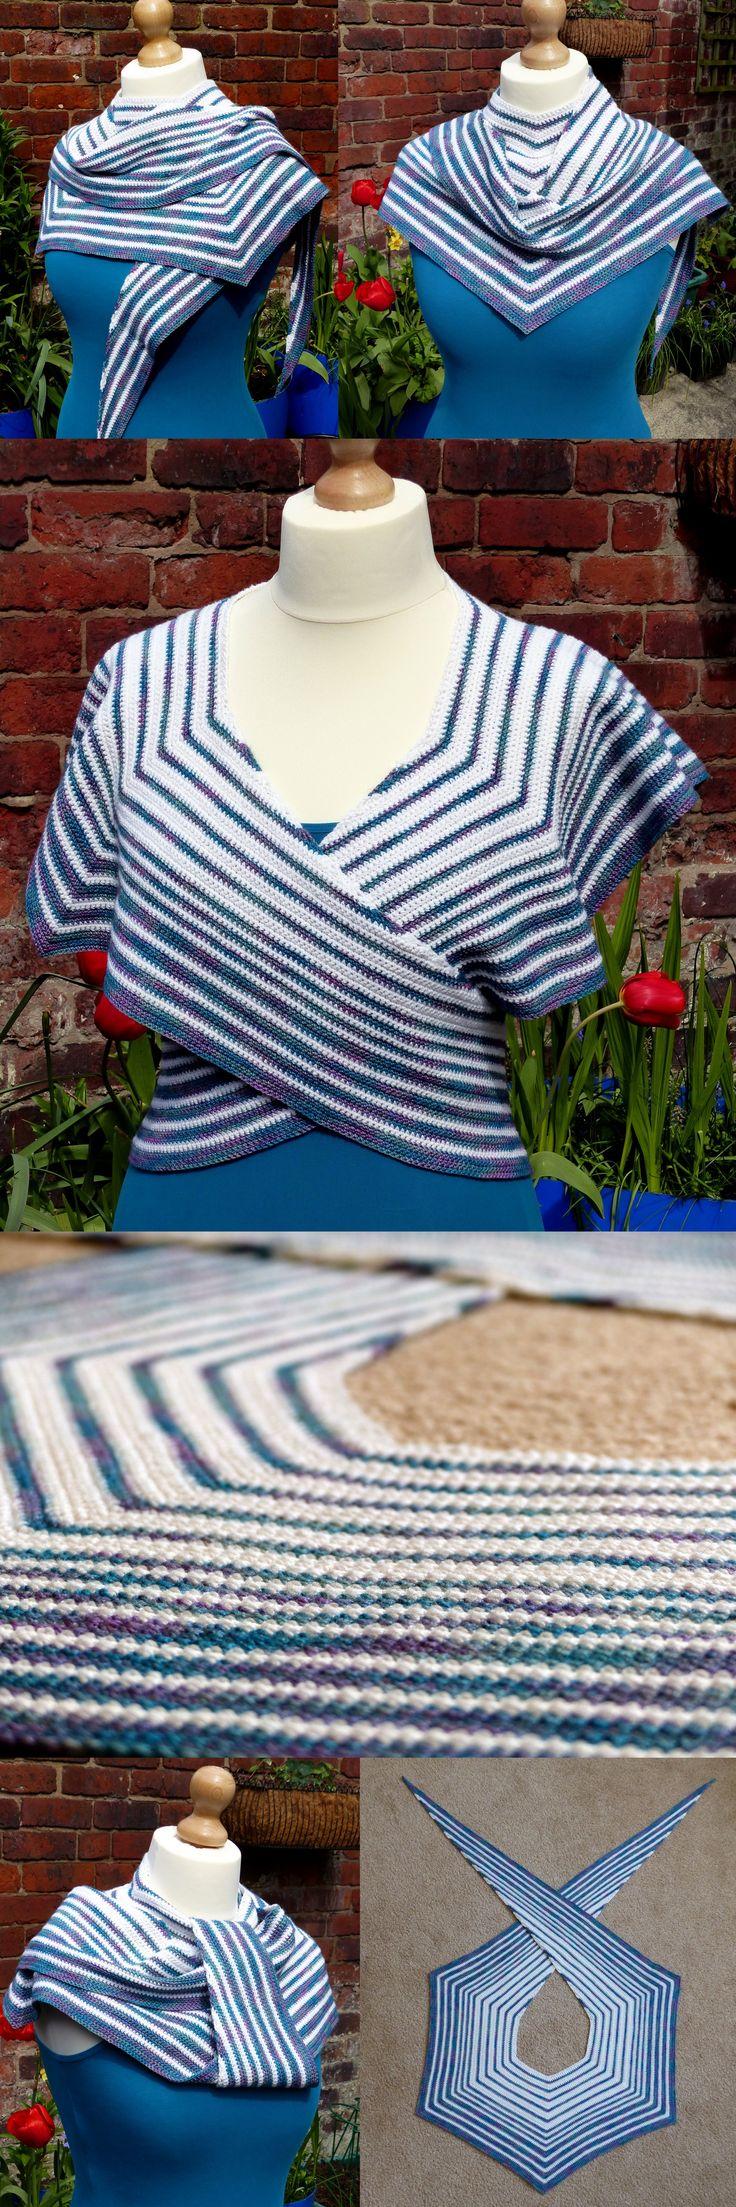 Pacific Rim Crochet Shawl By Esther Chandler - Free Crochet Pattern - (makemydaycreative)